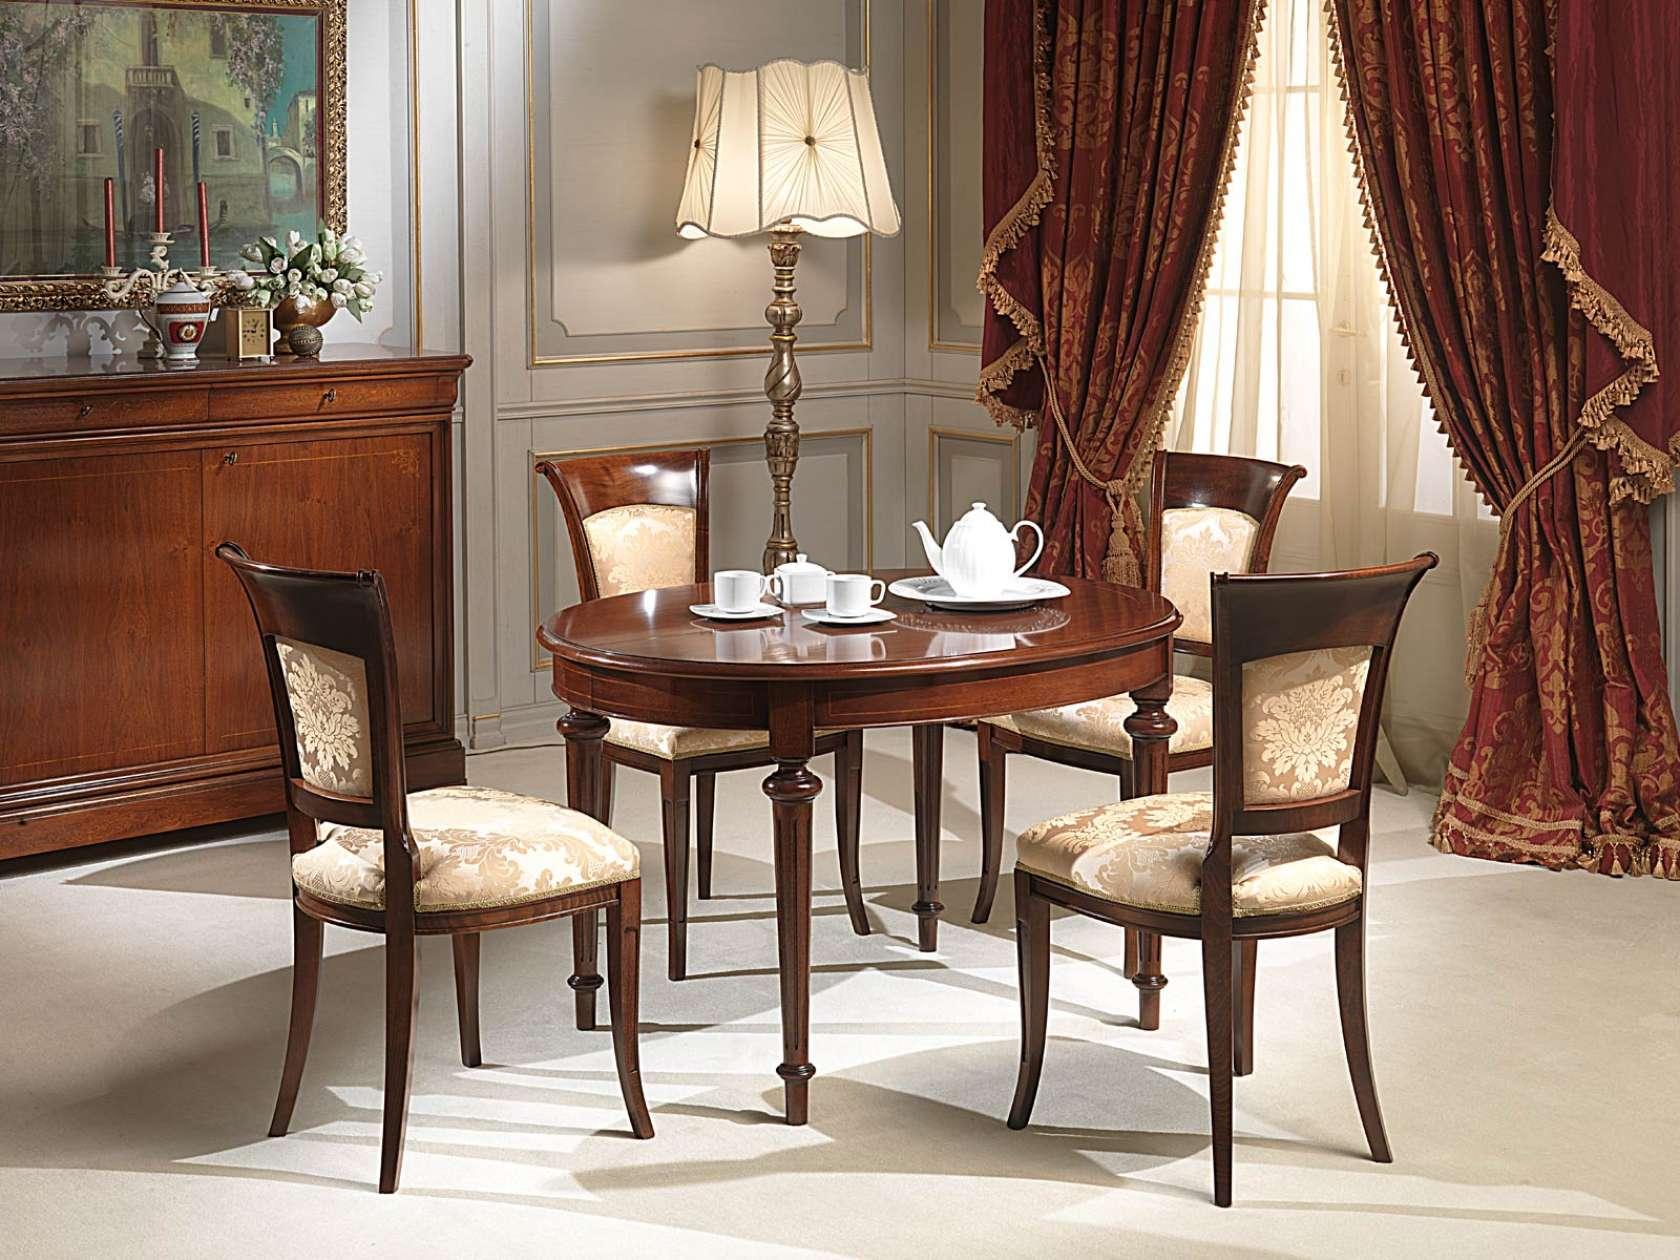 Tavolo ovale allungabile | Vimercati Meda